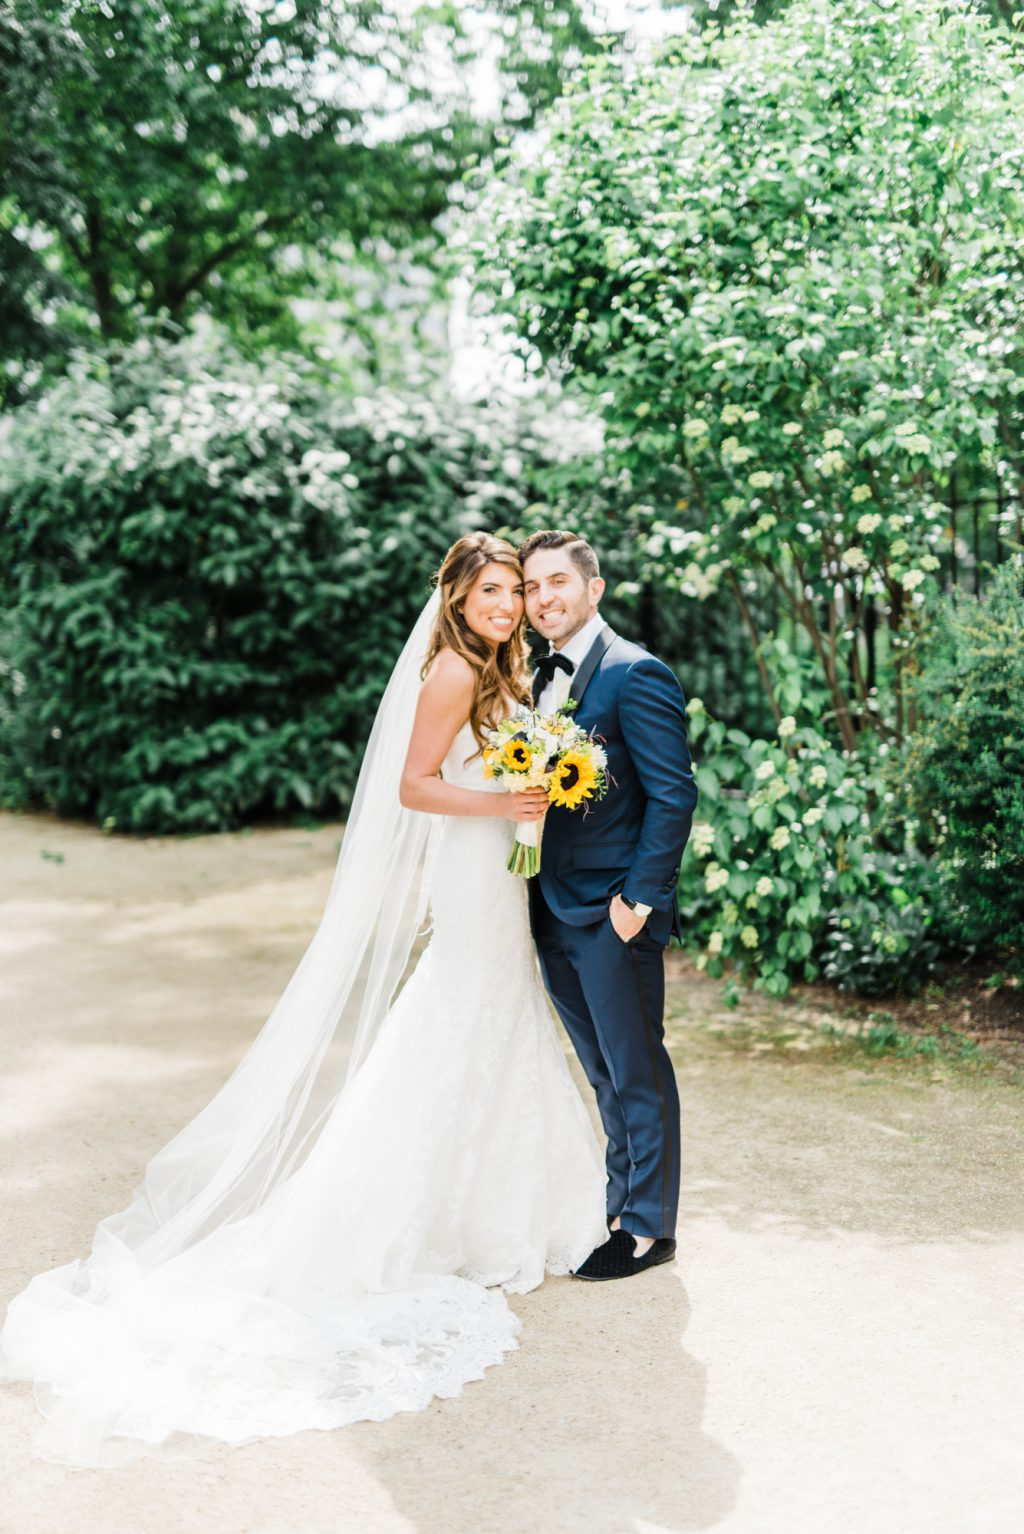 haleyrichterphoto-front-and-palmer-spring-wedding-rodin-museum-loews-hotel-philadelphia-084